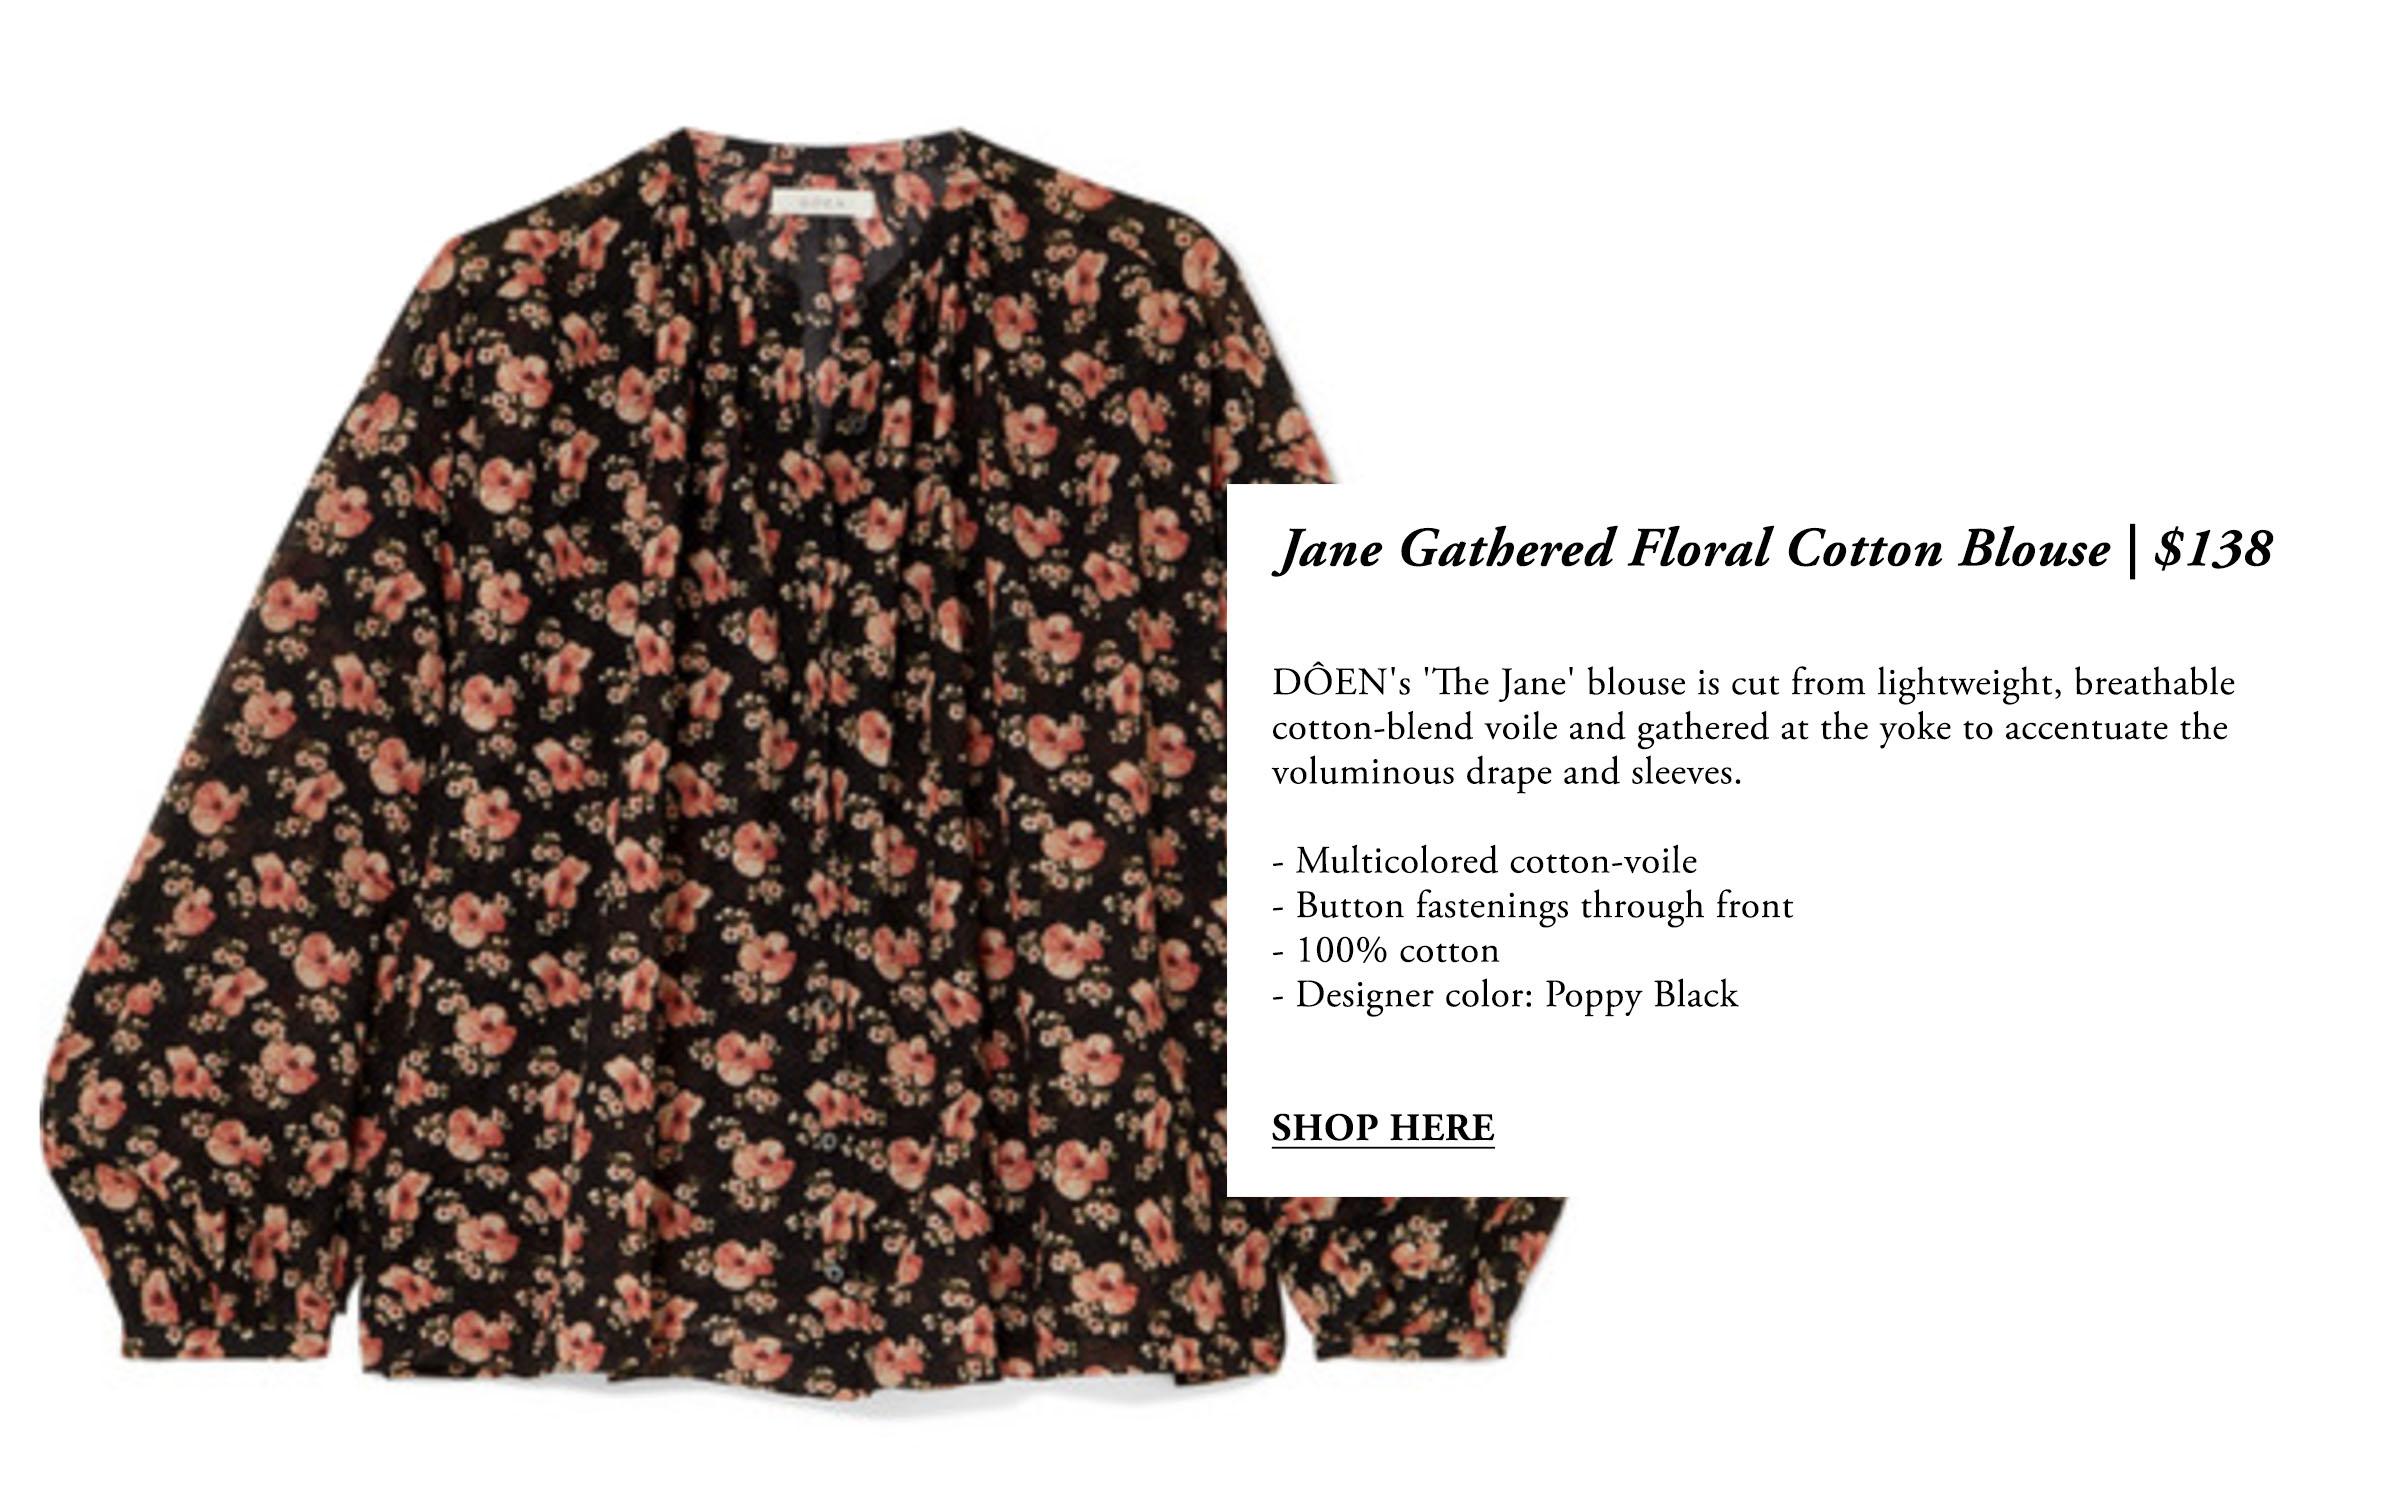 doen-jane-floral-blouse.jpg